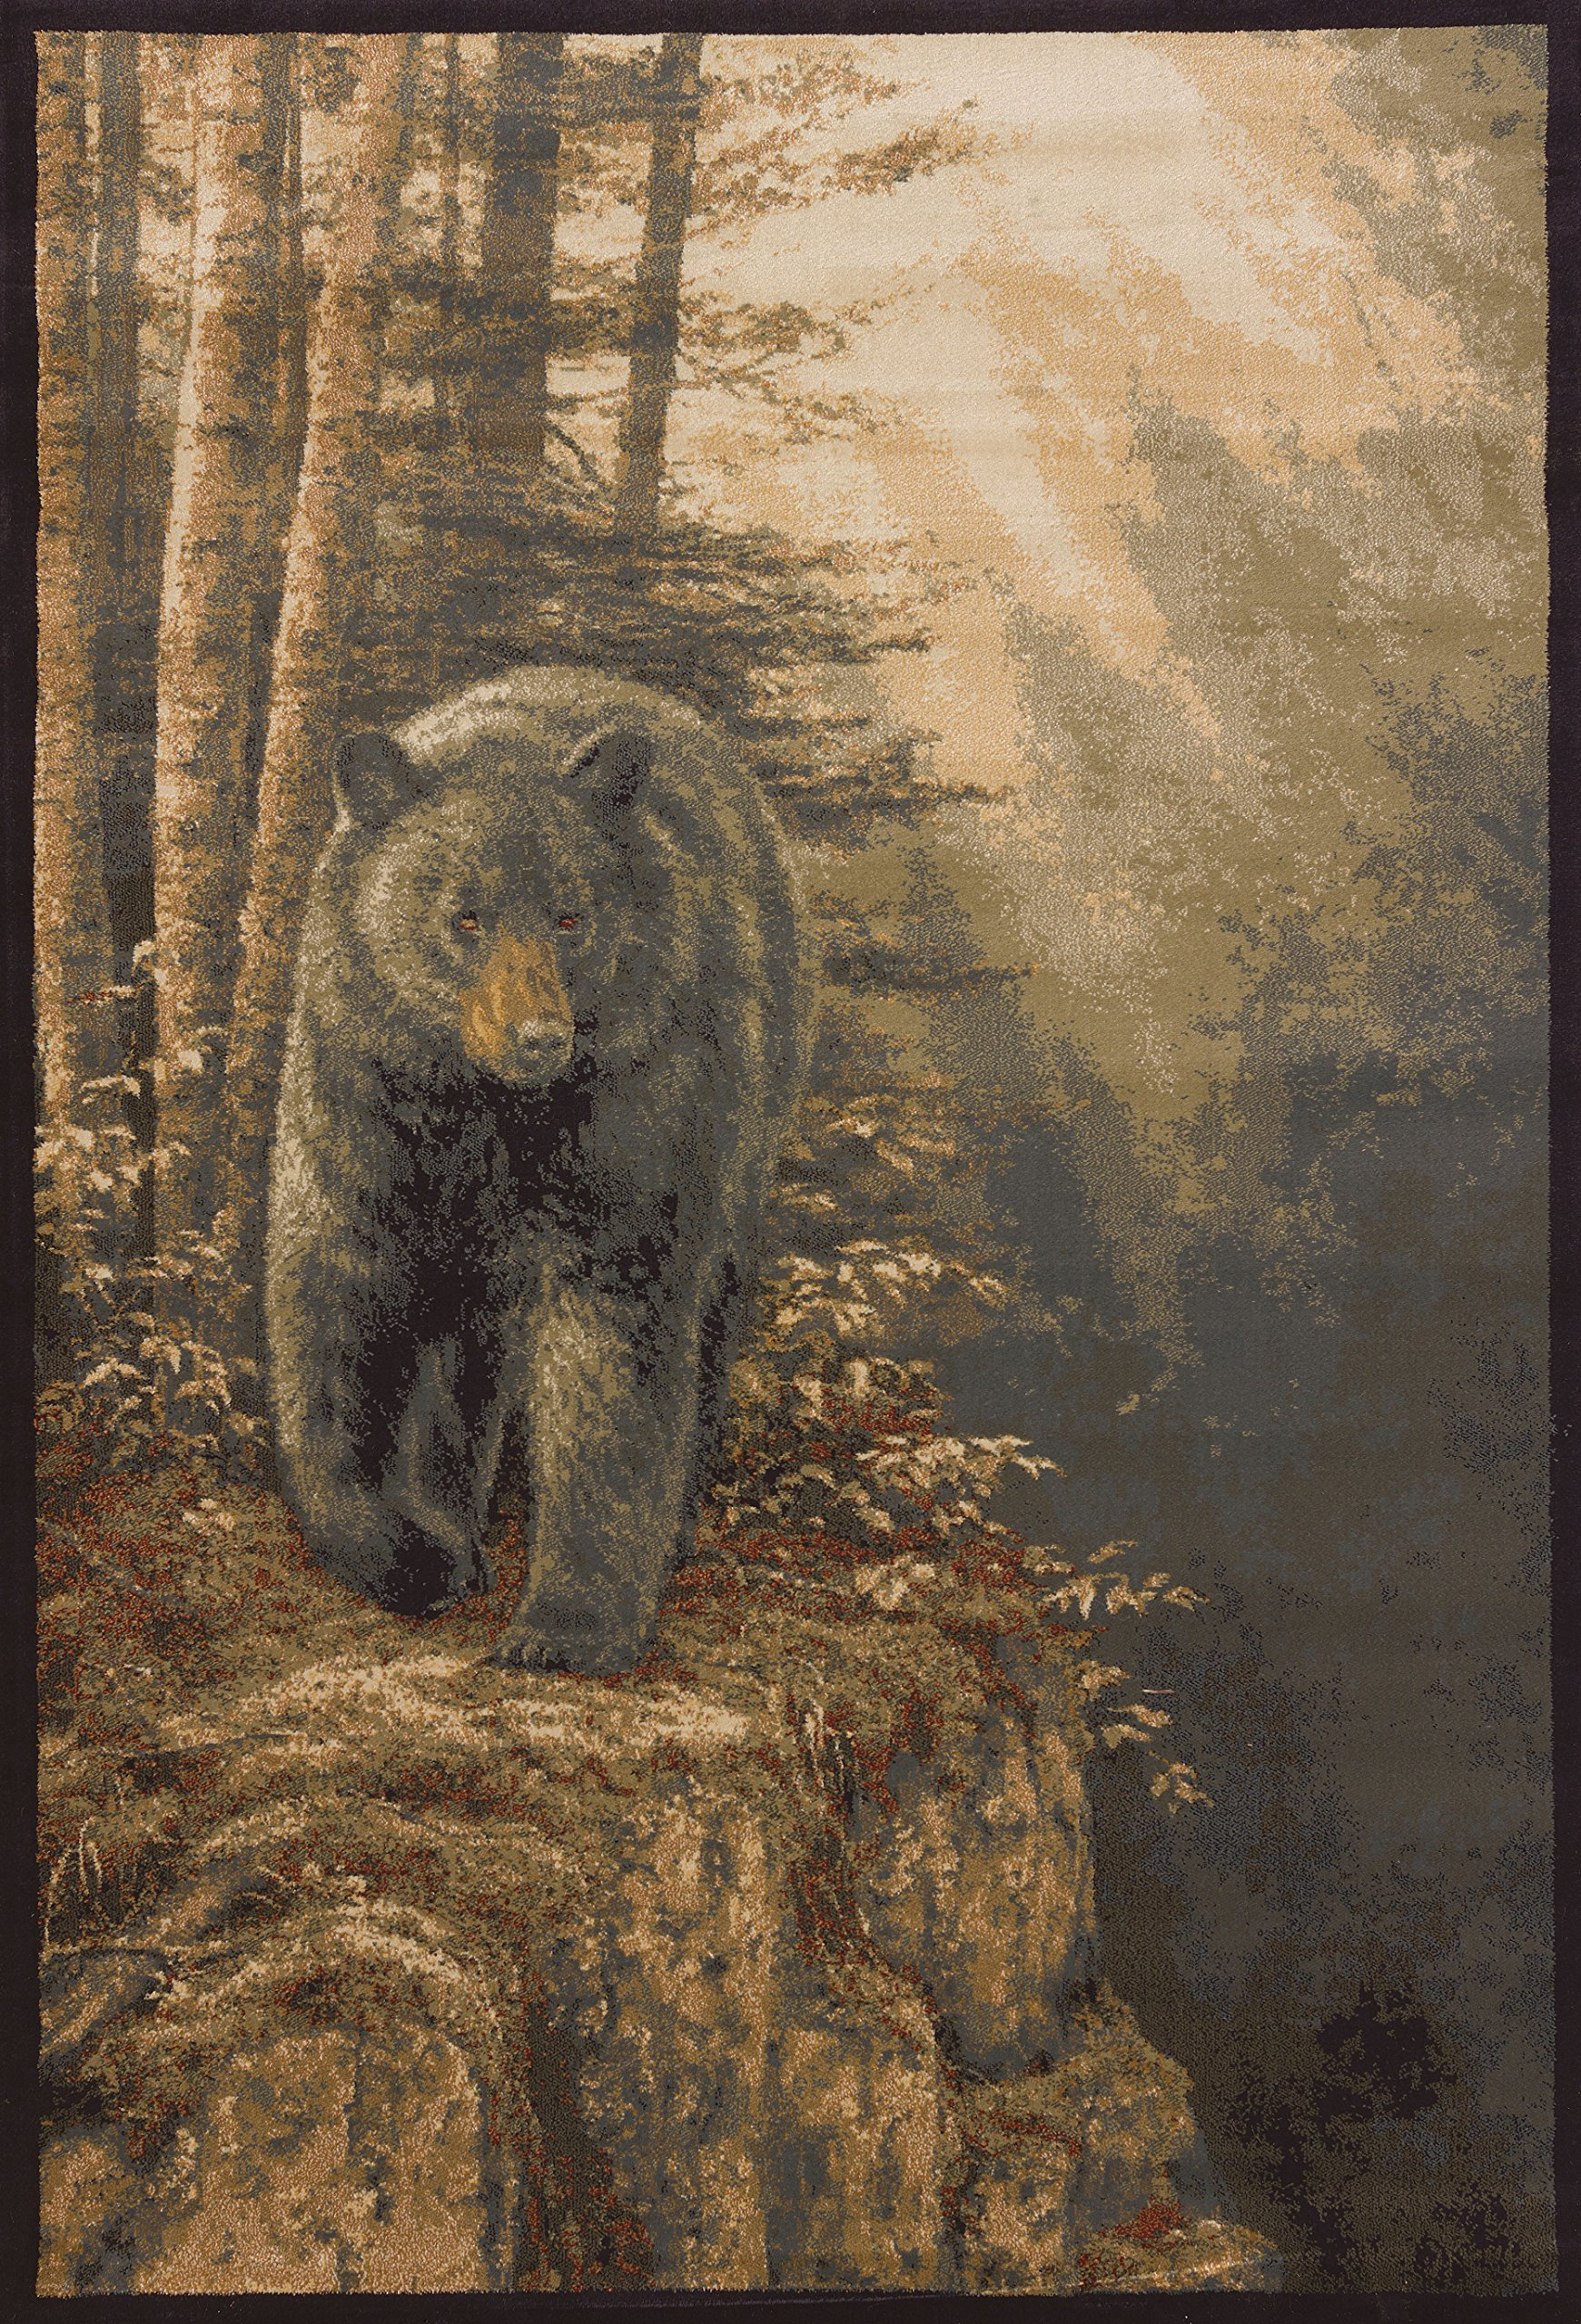 United Weavers of America Segma Rocky Black Bear Area Rug, Natural, 1'10'' x 3'